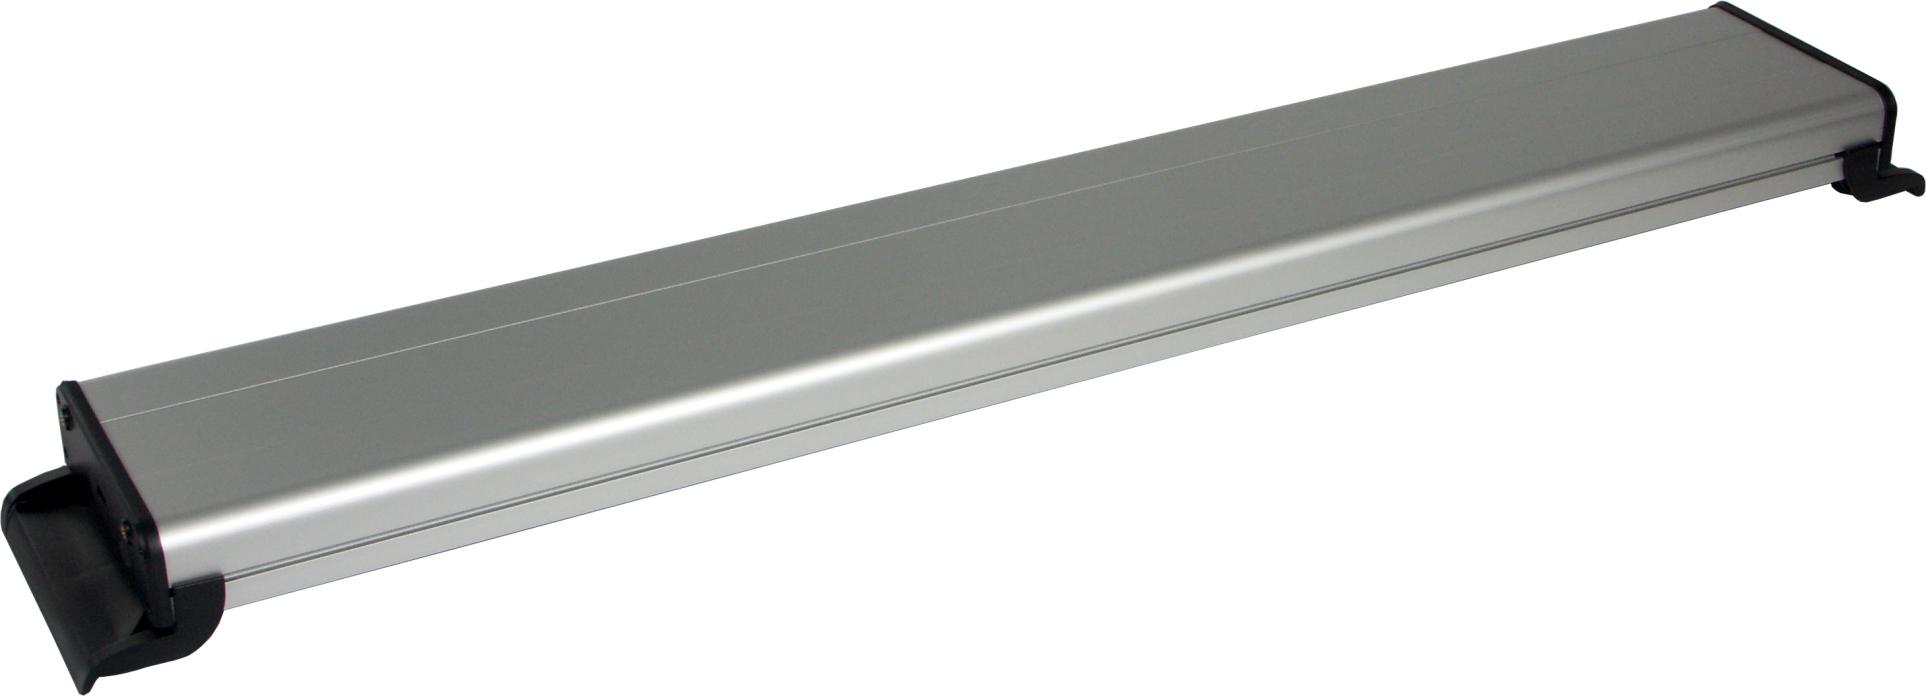 Shop sera LED fixture 1200